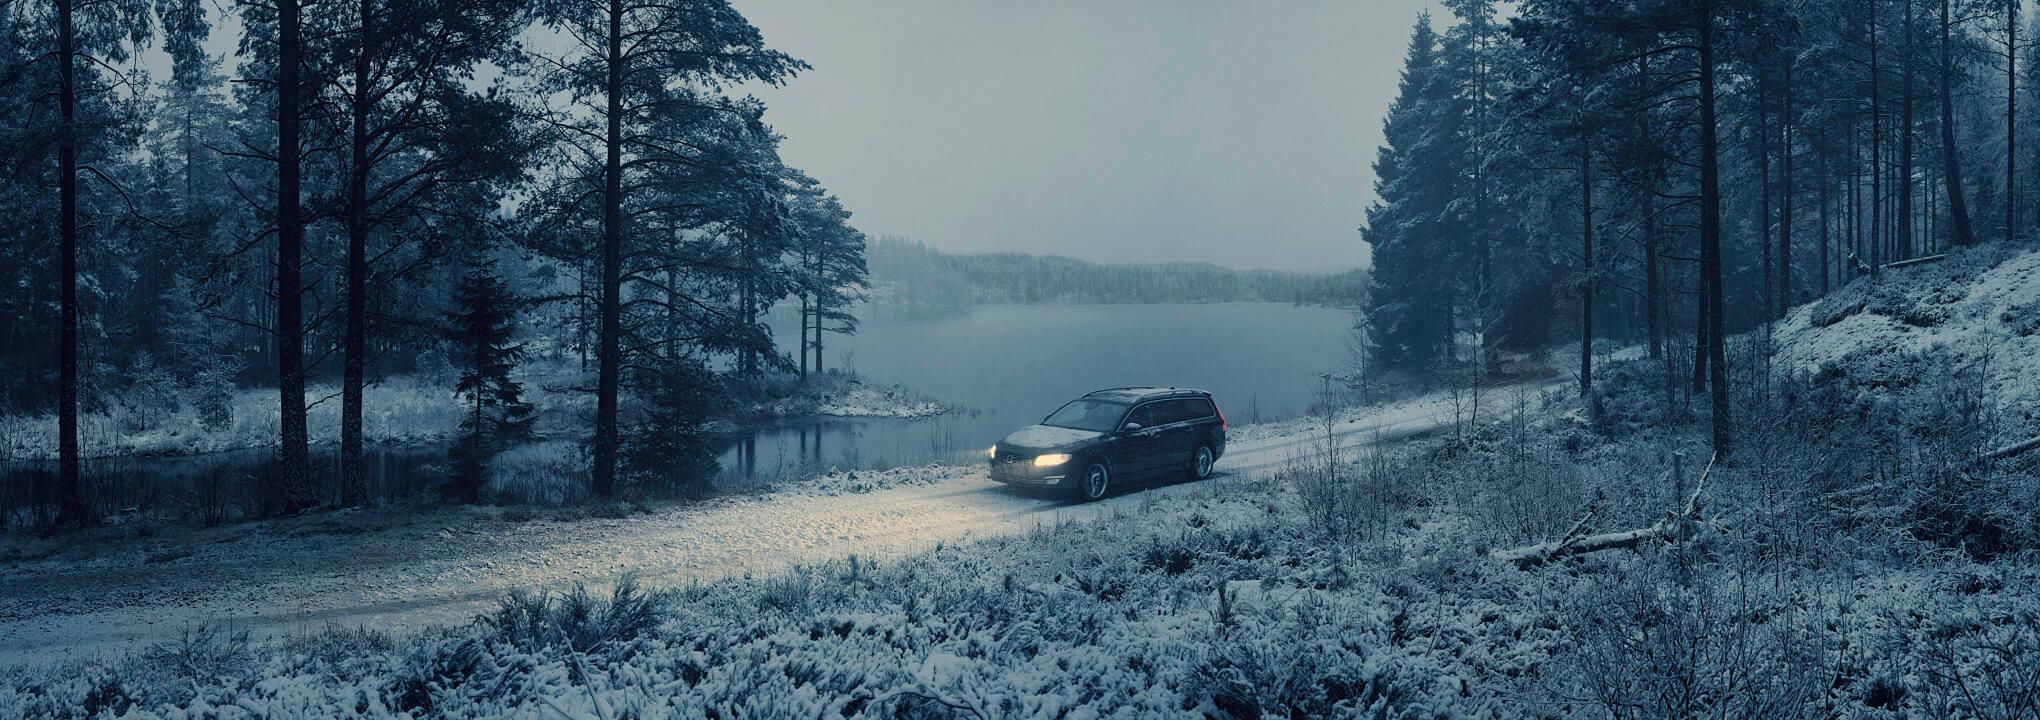 Volvo Made By Sweden Dalsland